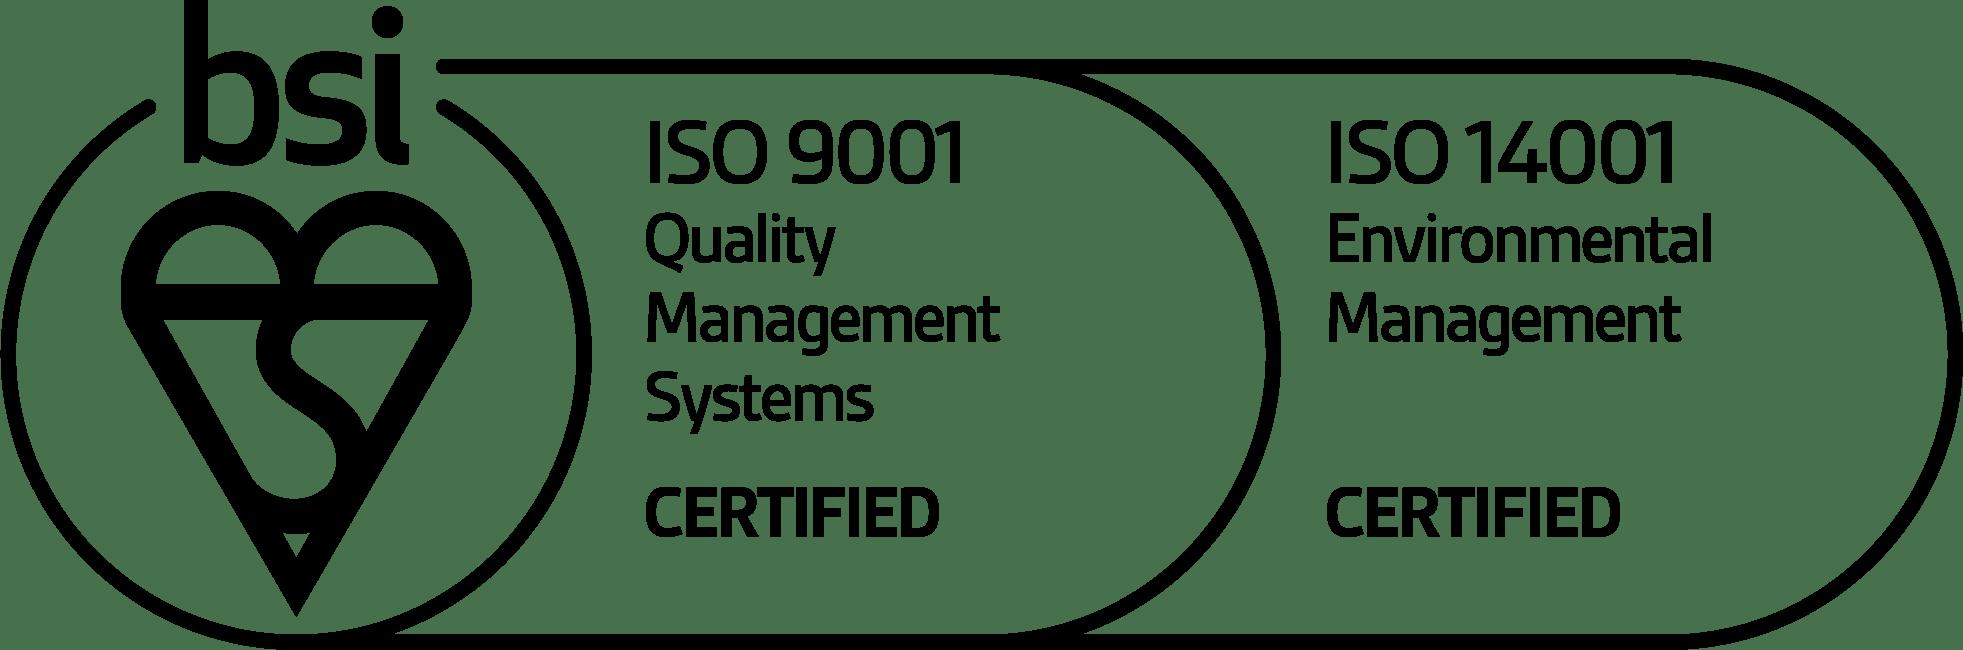 mark of trust ISO BSI